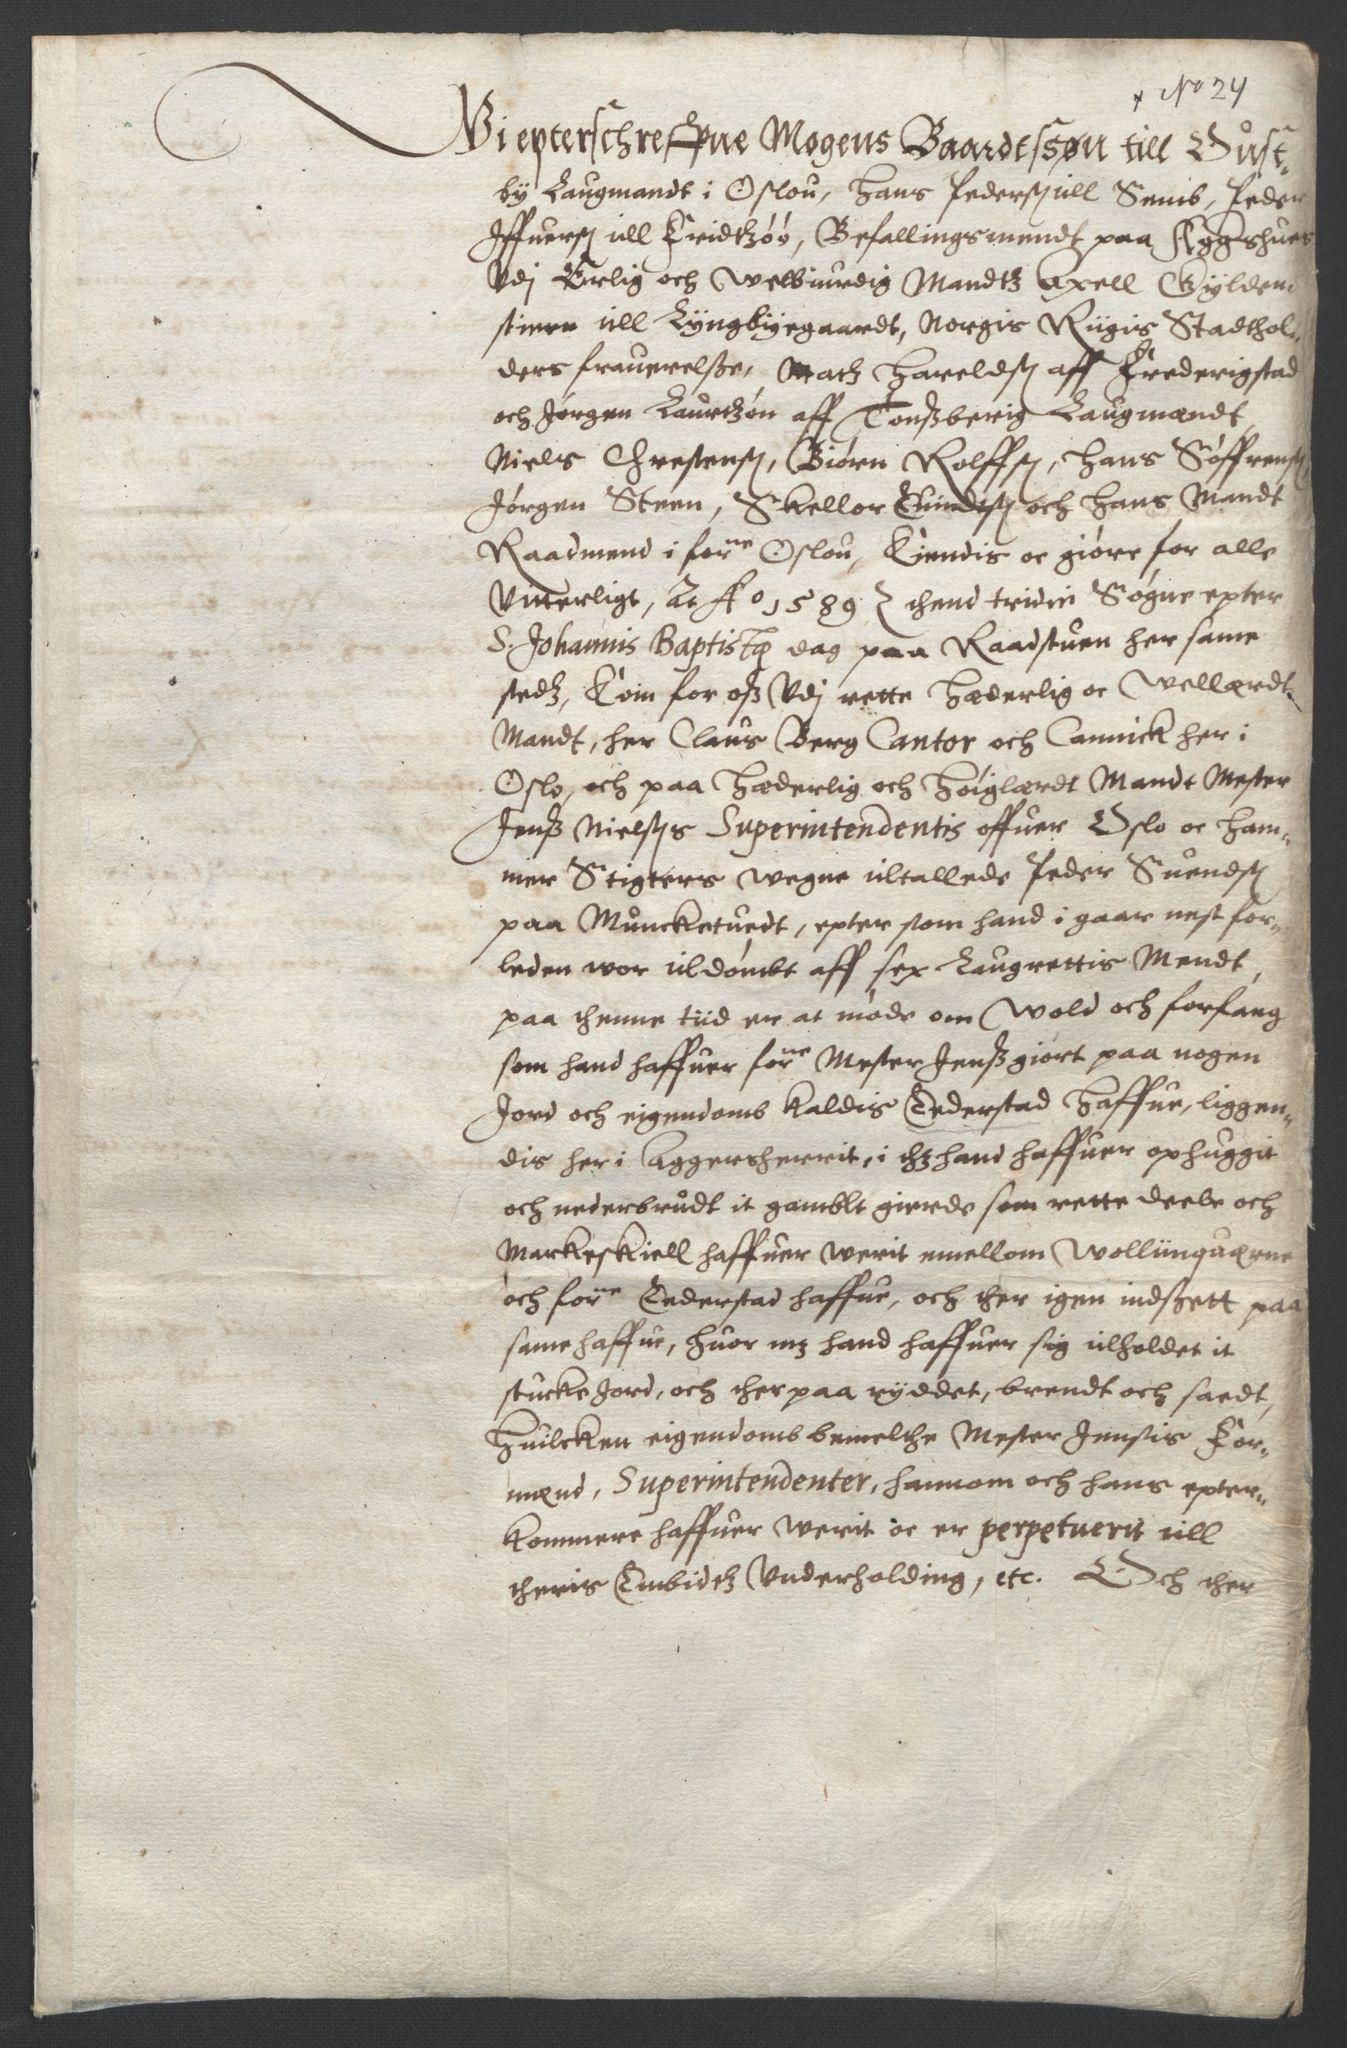 SAO, Oslo stiftsdireksjon, G/Gb/L0001: Bispestolens dokumenter, 1584-1612, s. 24